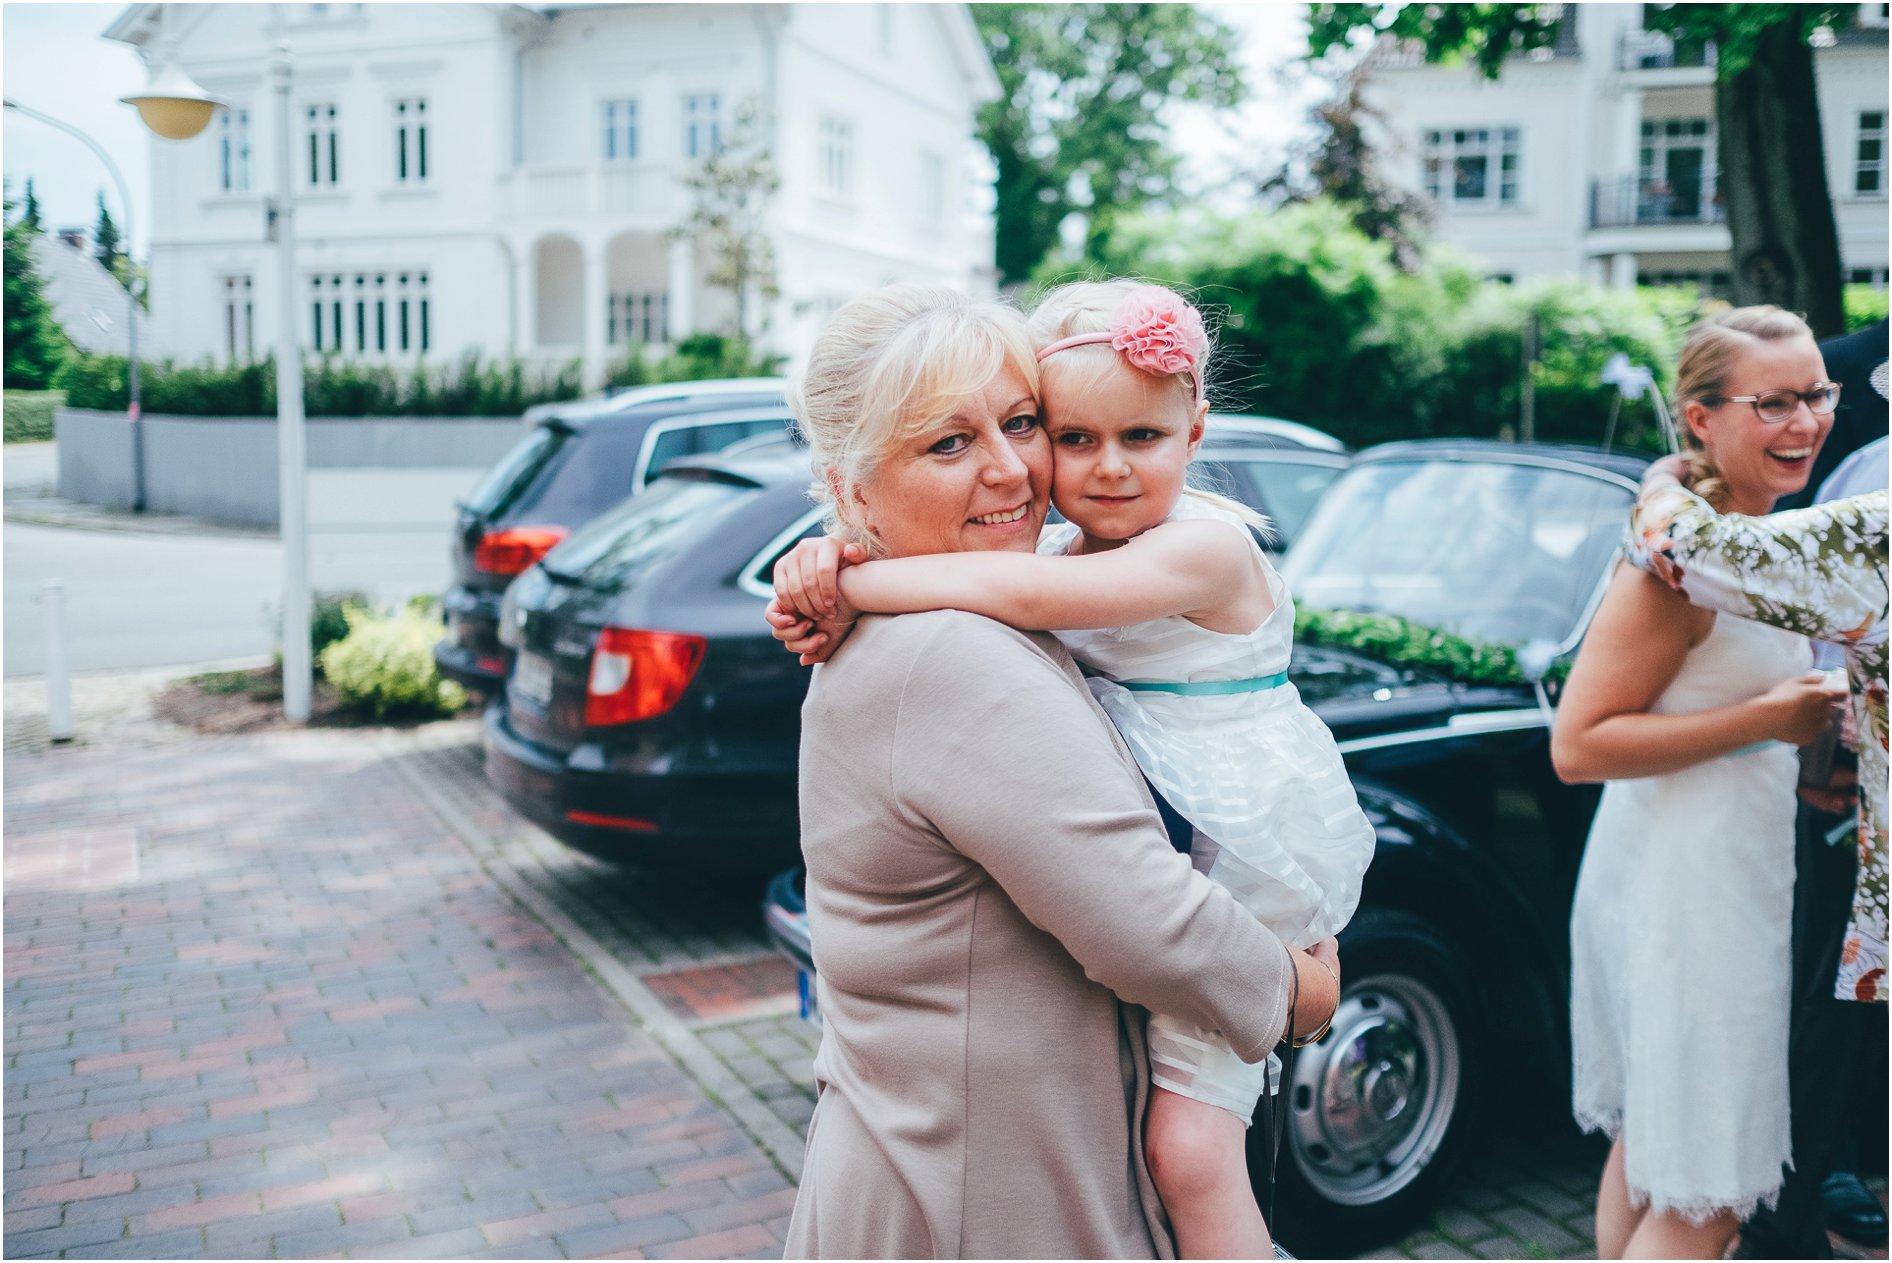 2016-04-19_0003 Sandra & Janis - Hochzeitsfotograf in Seevetal